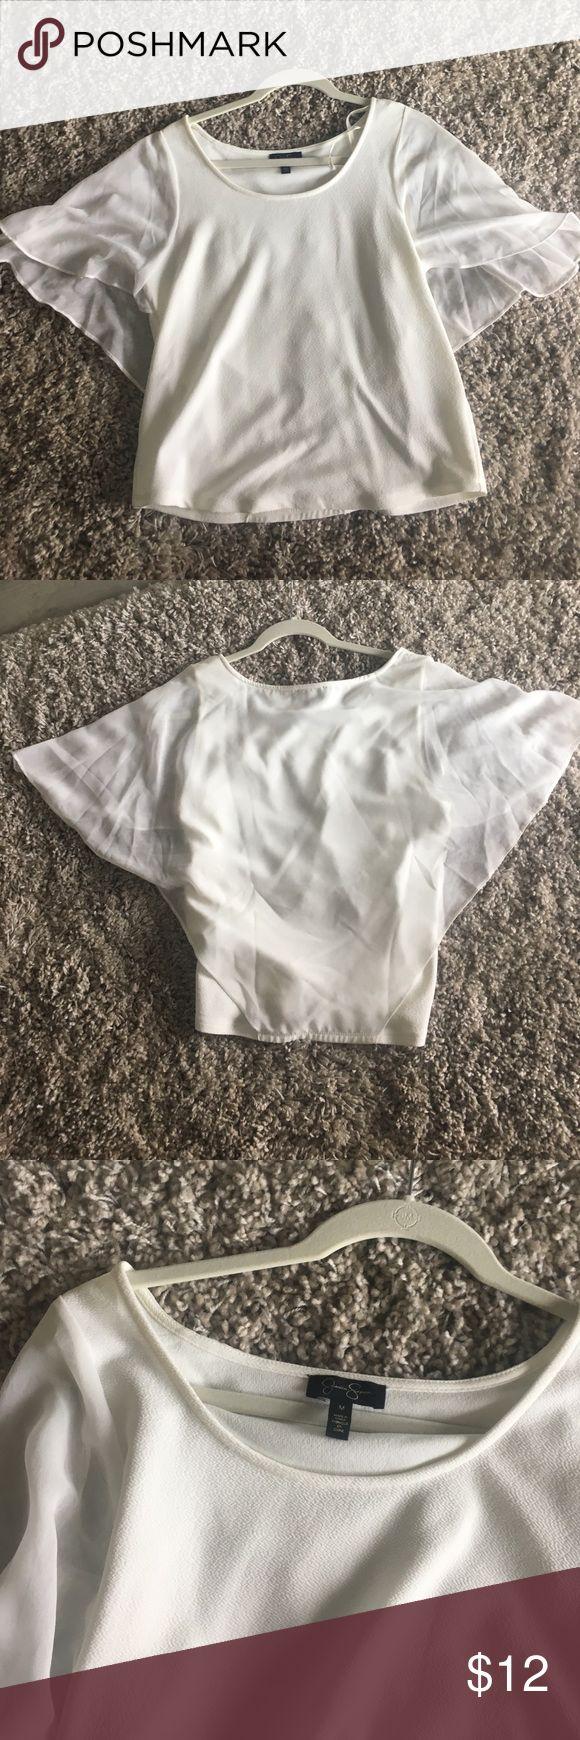 White Jessica Simpson shirt never worn Size medium sheer sleeves Jessica Simpson Tops Blouses